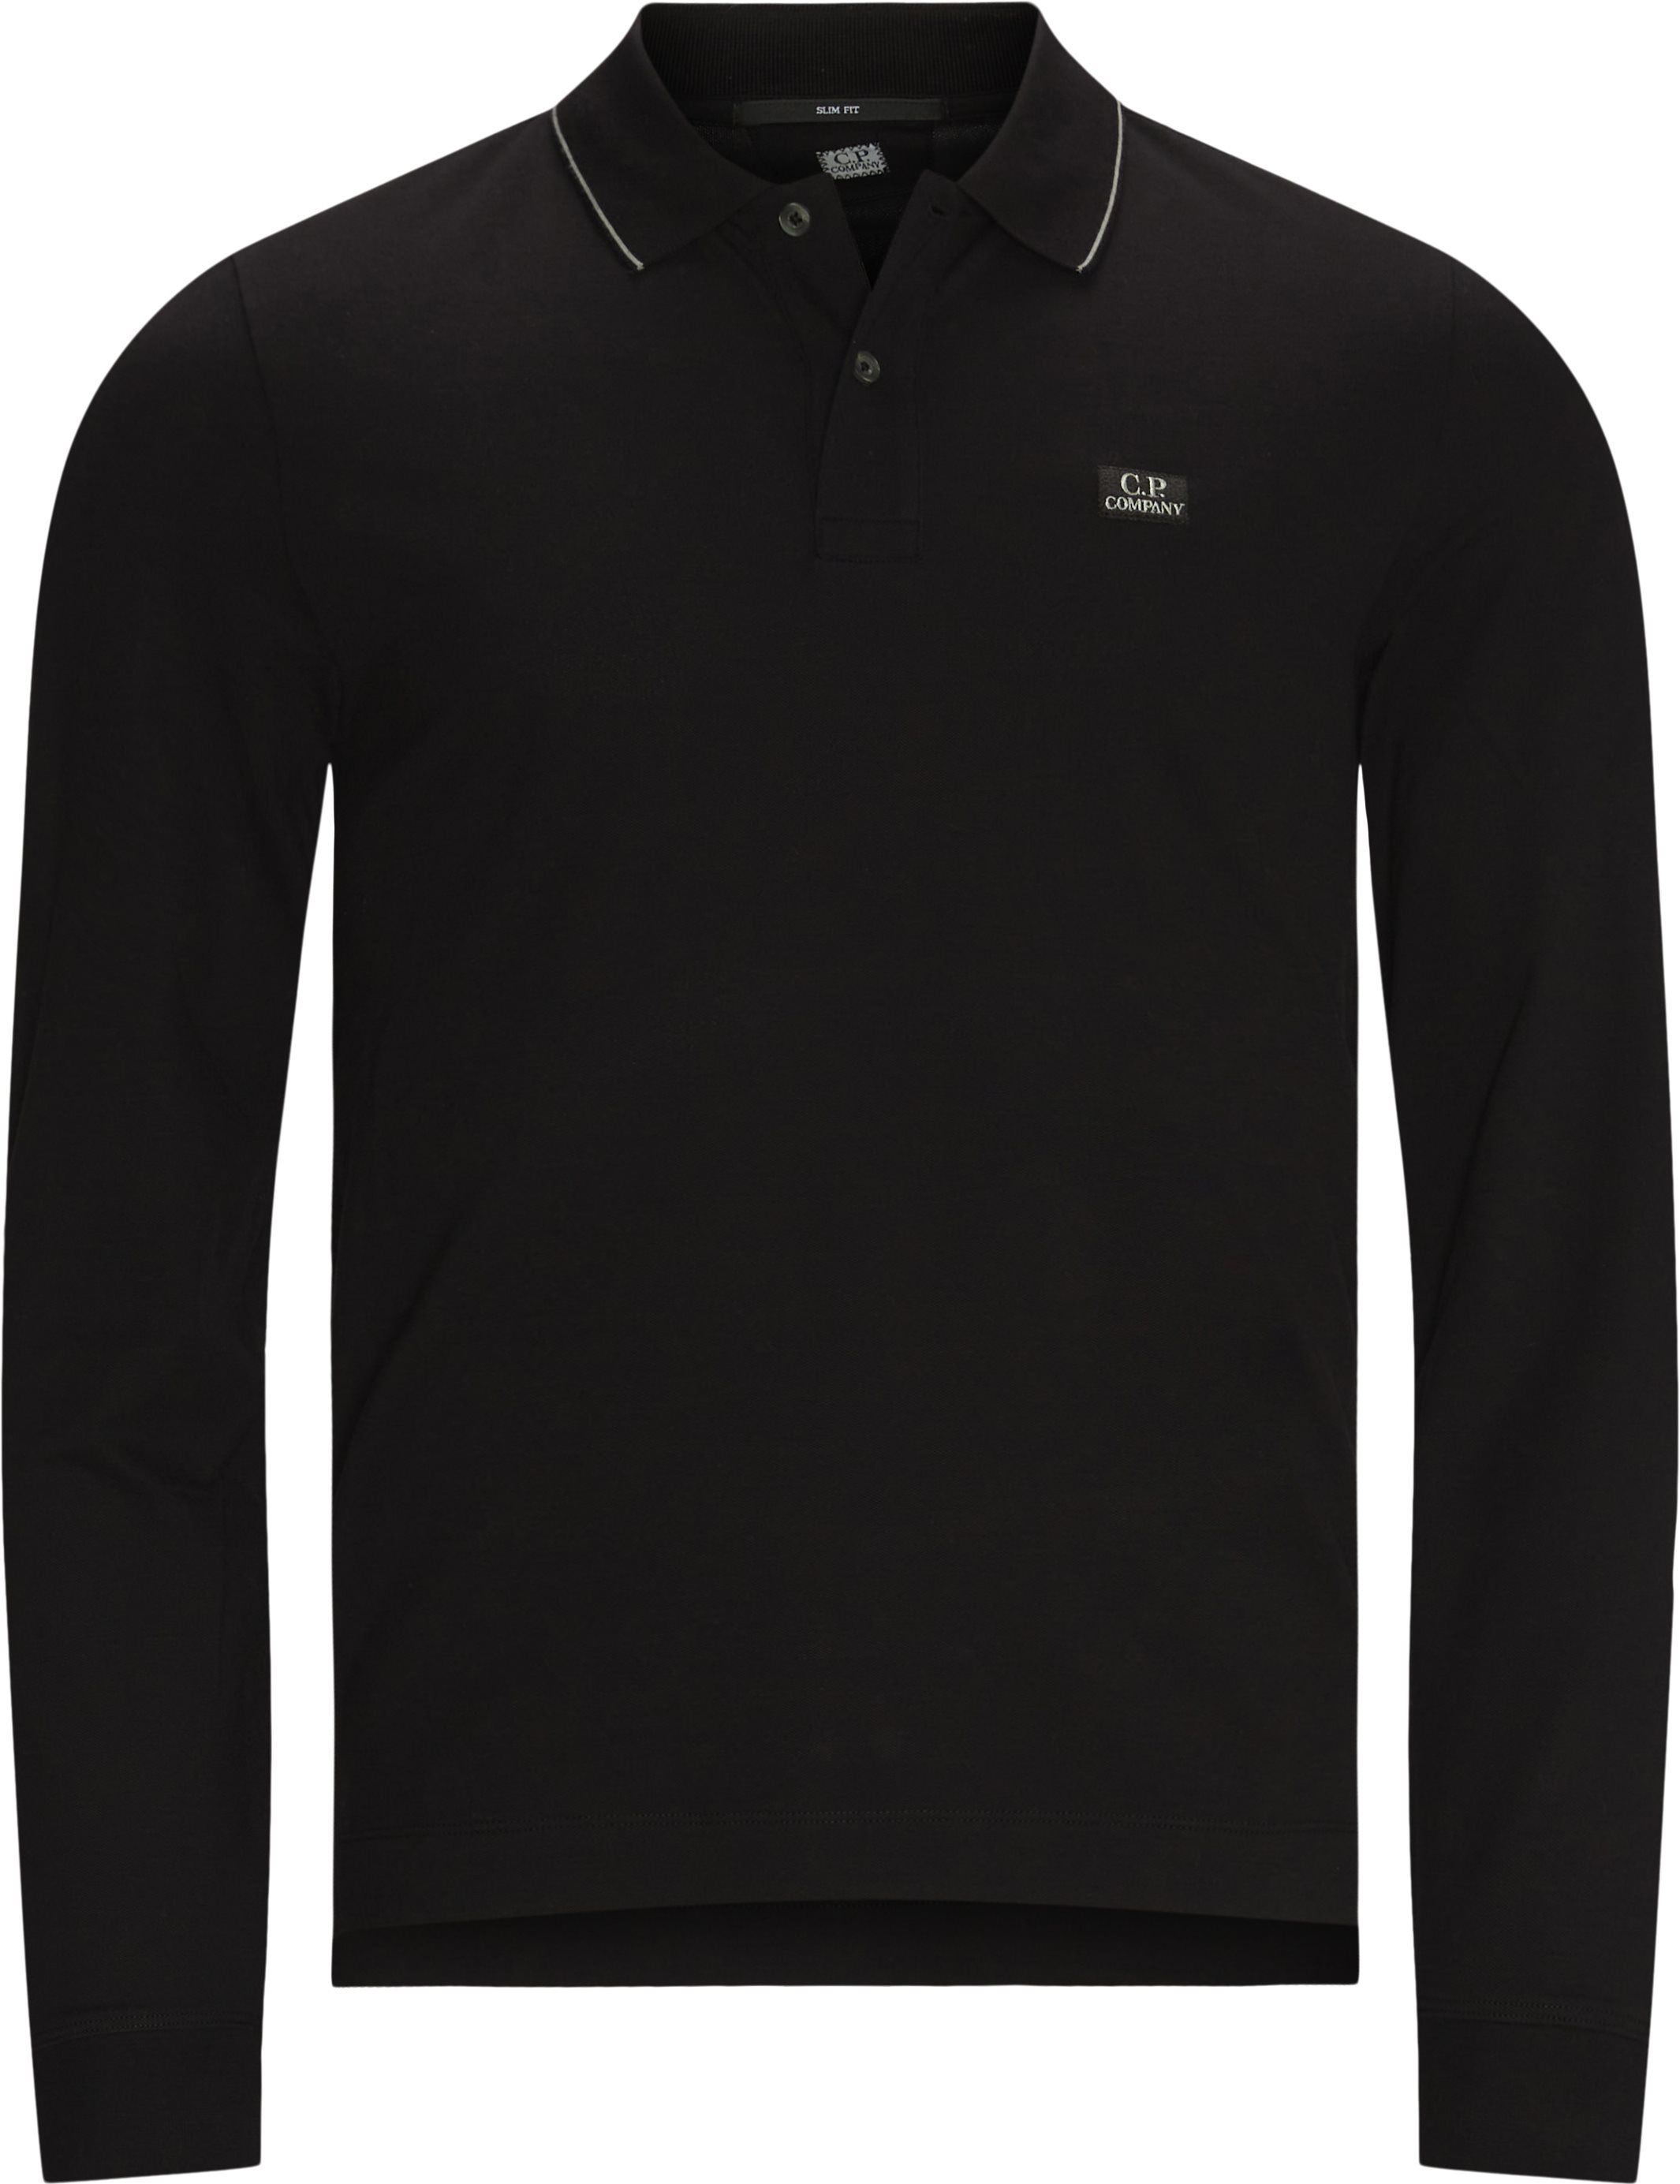 Long-sleeved t-shirts - Slim fit - Black